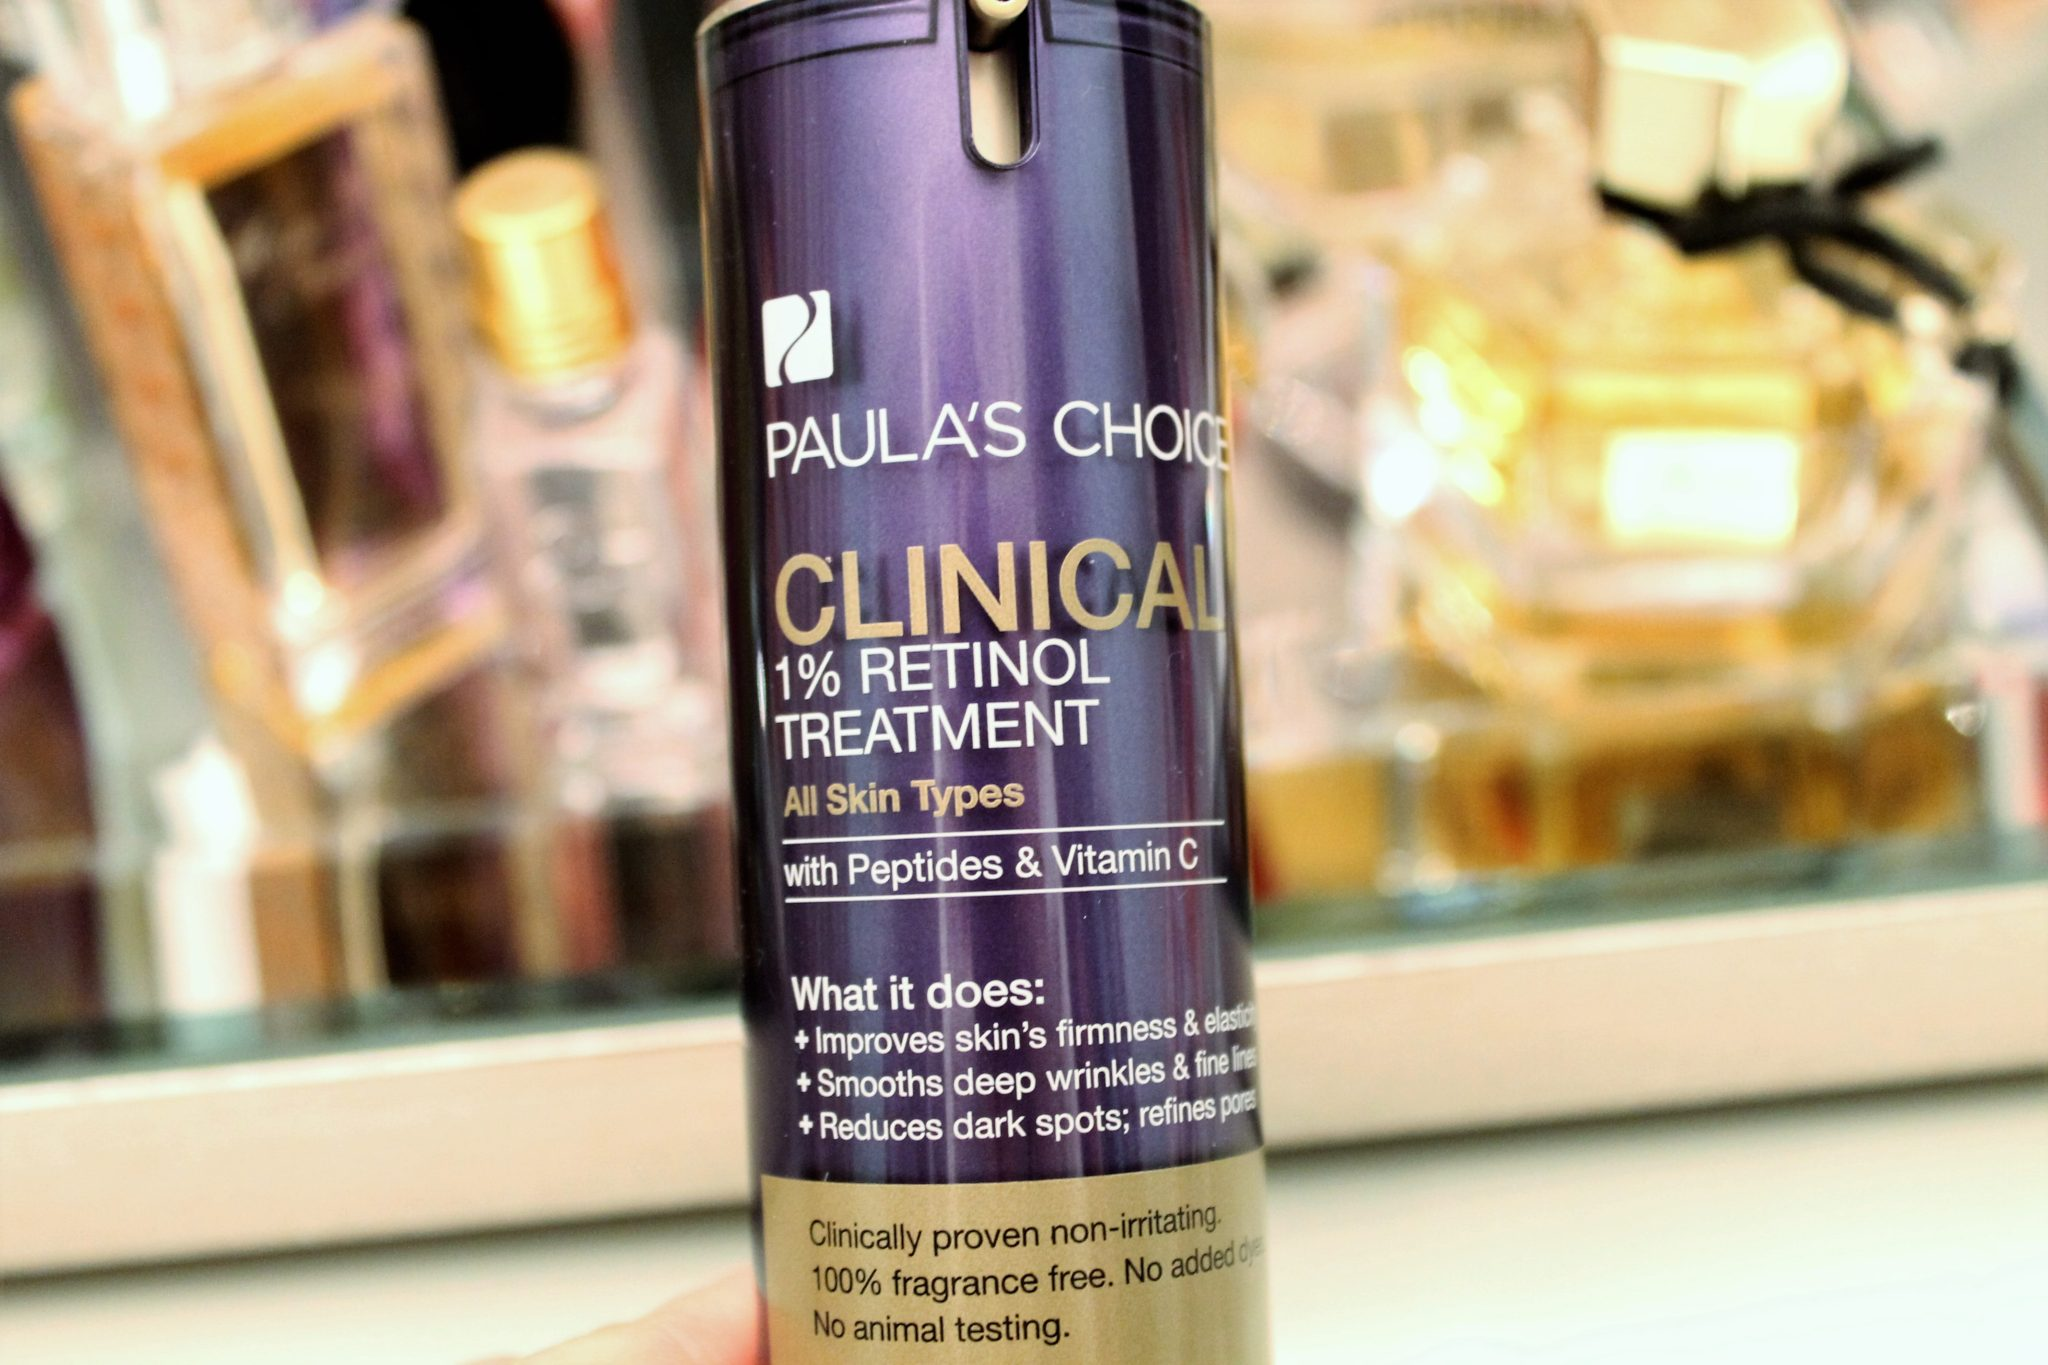 Paulas-Choice-Clinical-Retinol-review